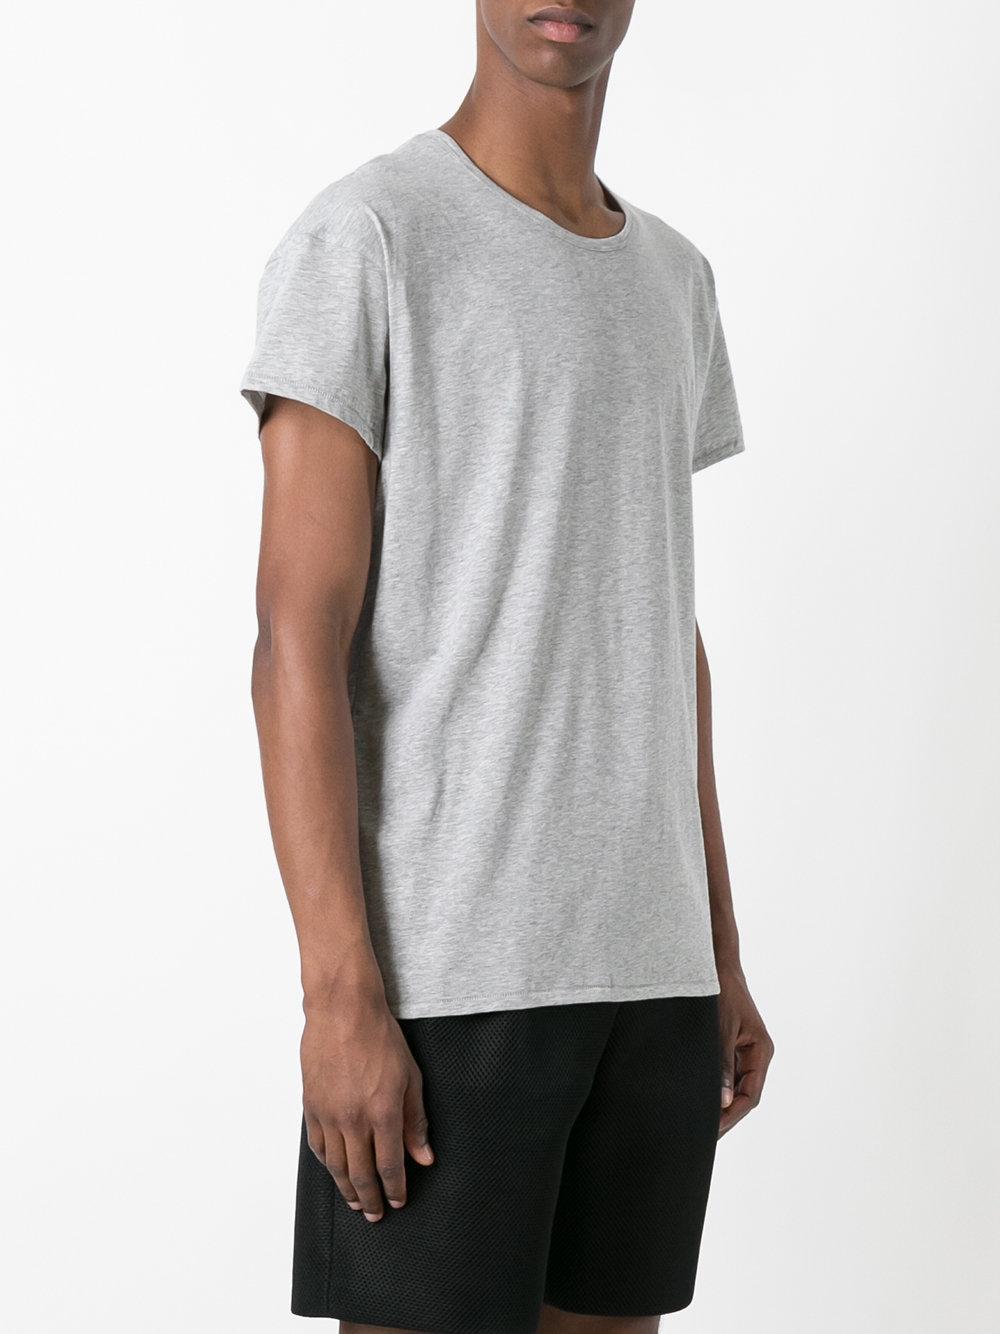 The white briefs Sunset T-shirt in Gray for Men